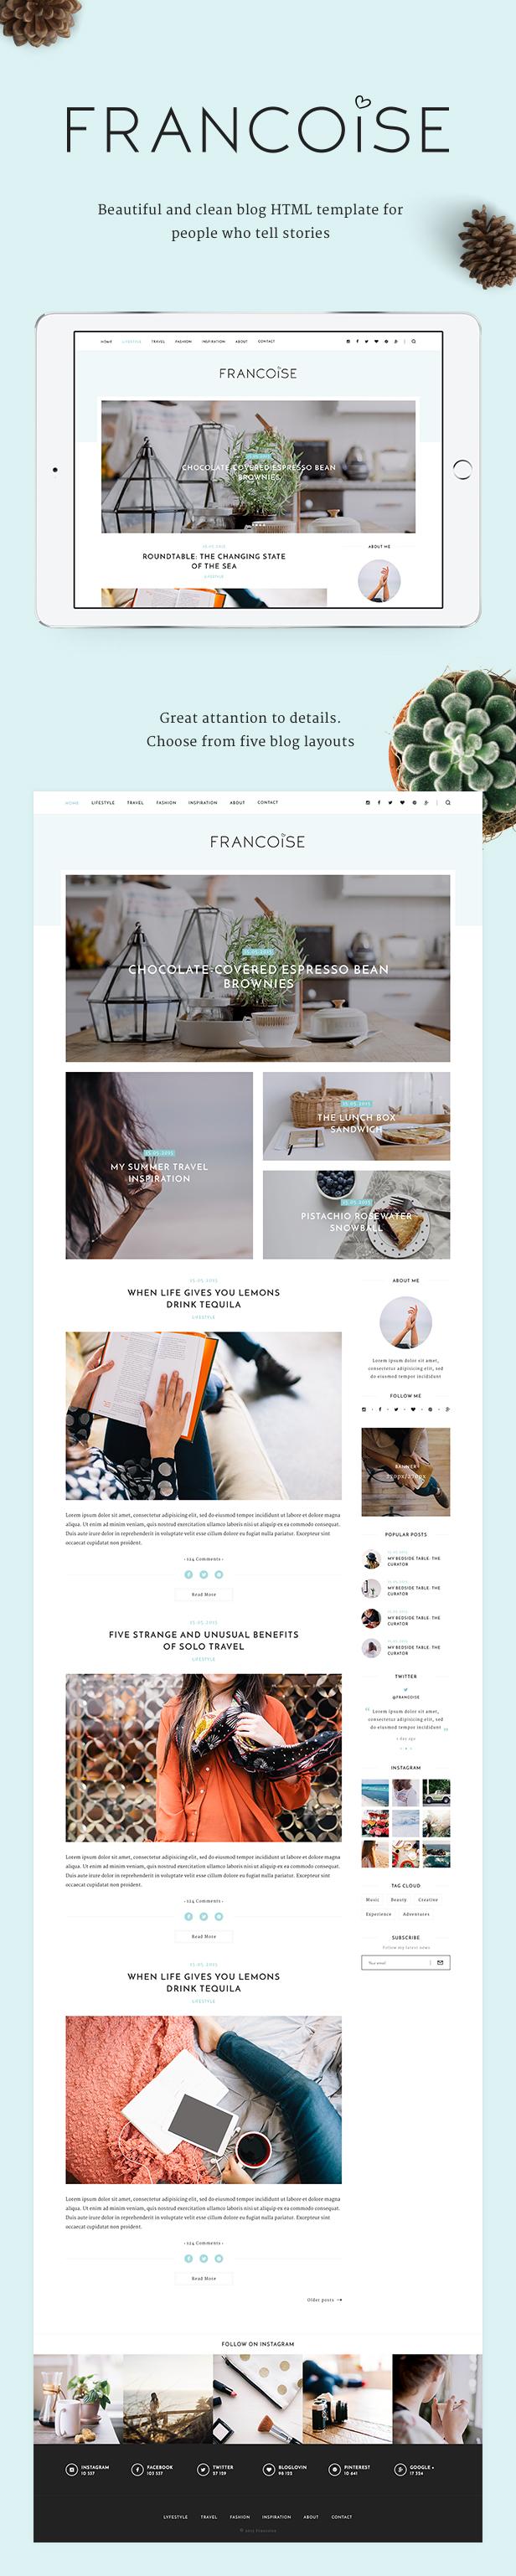 Francoise - Blog HTML Template by HighSea | ThemeForest